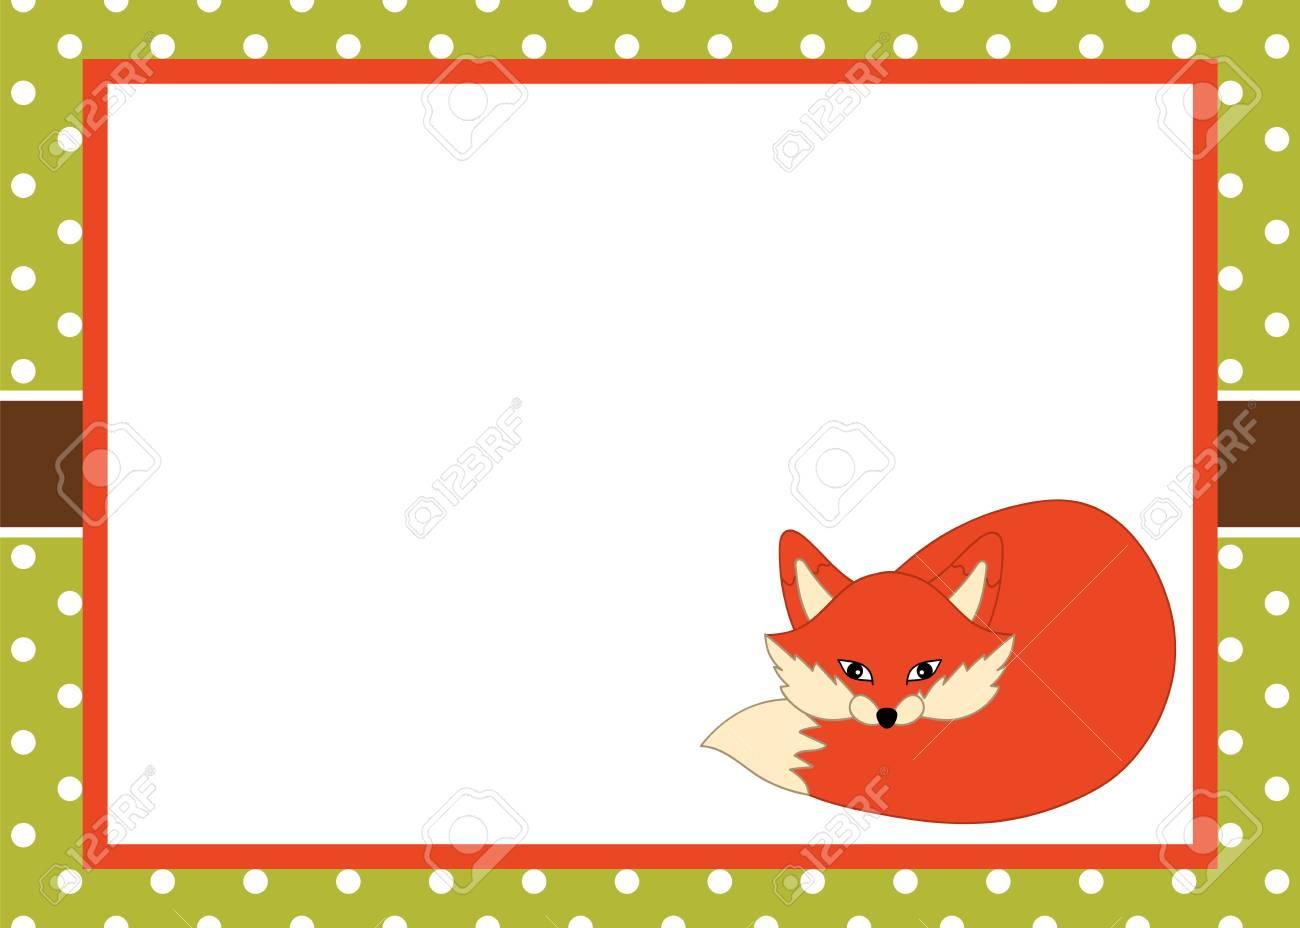 Vector Card Template With A Cute Fox On Polka Dot Background